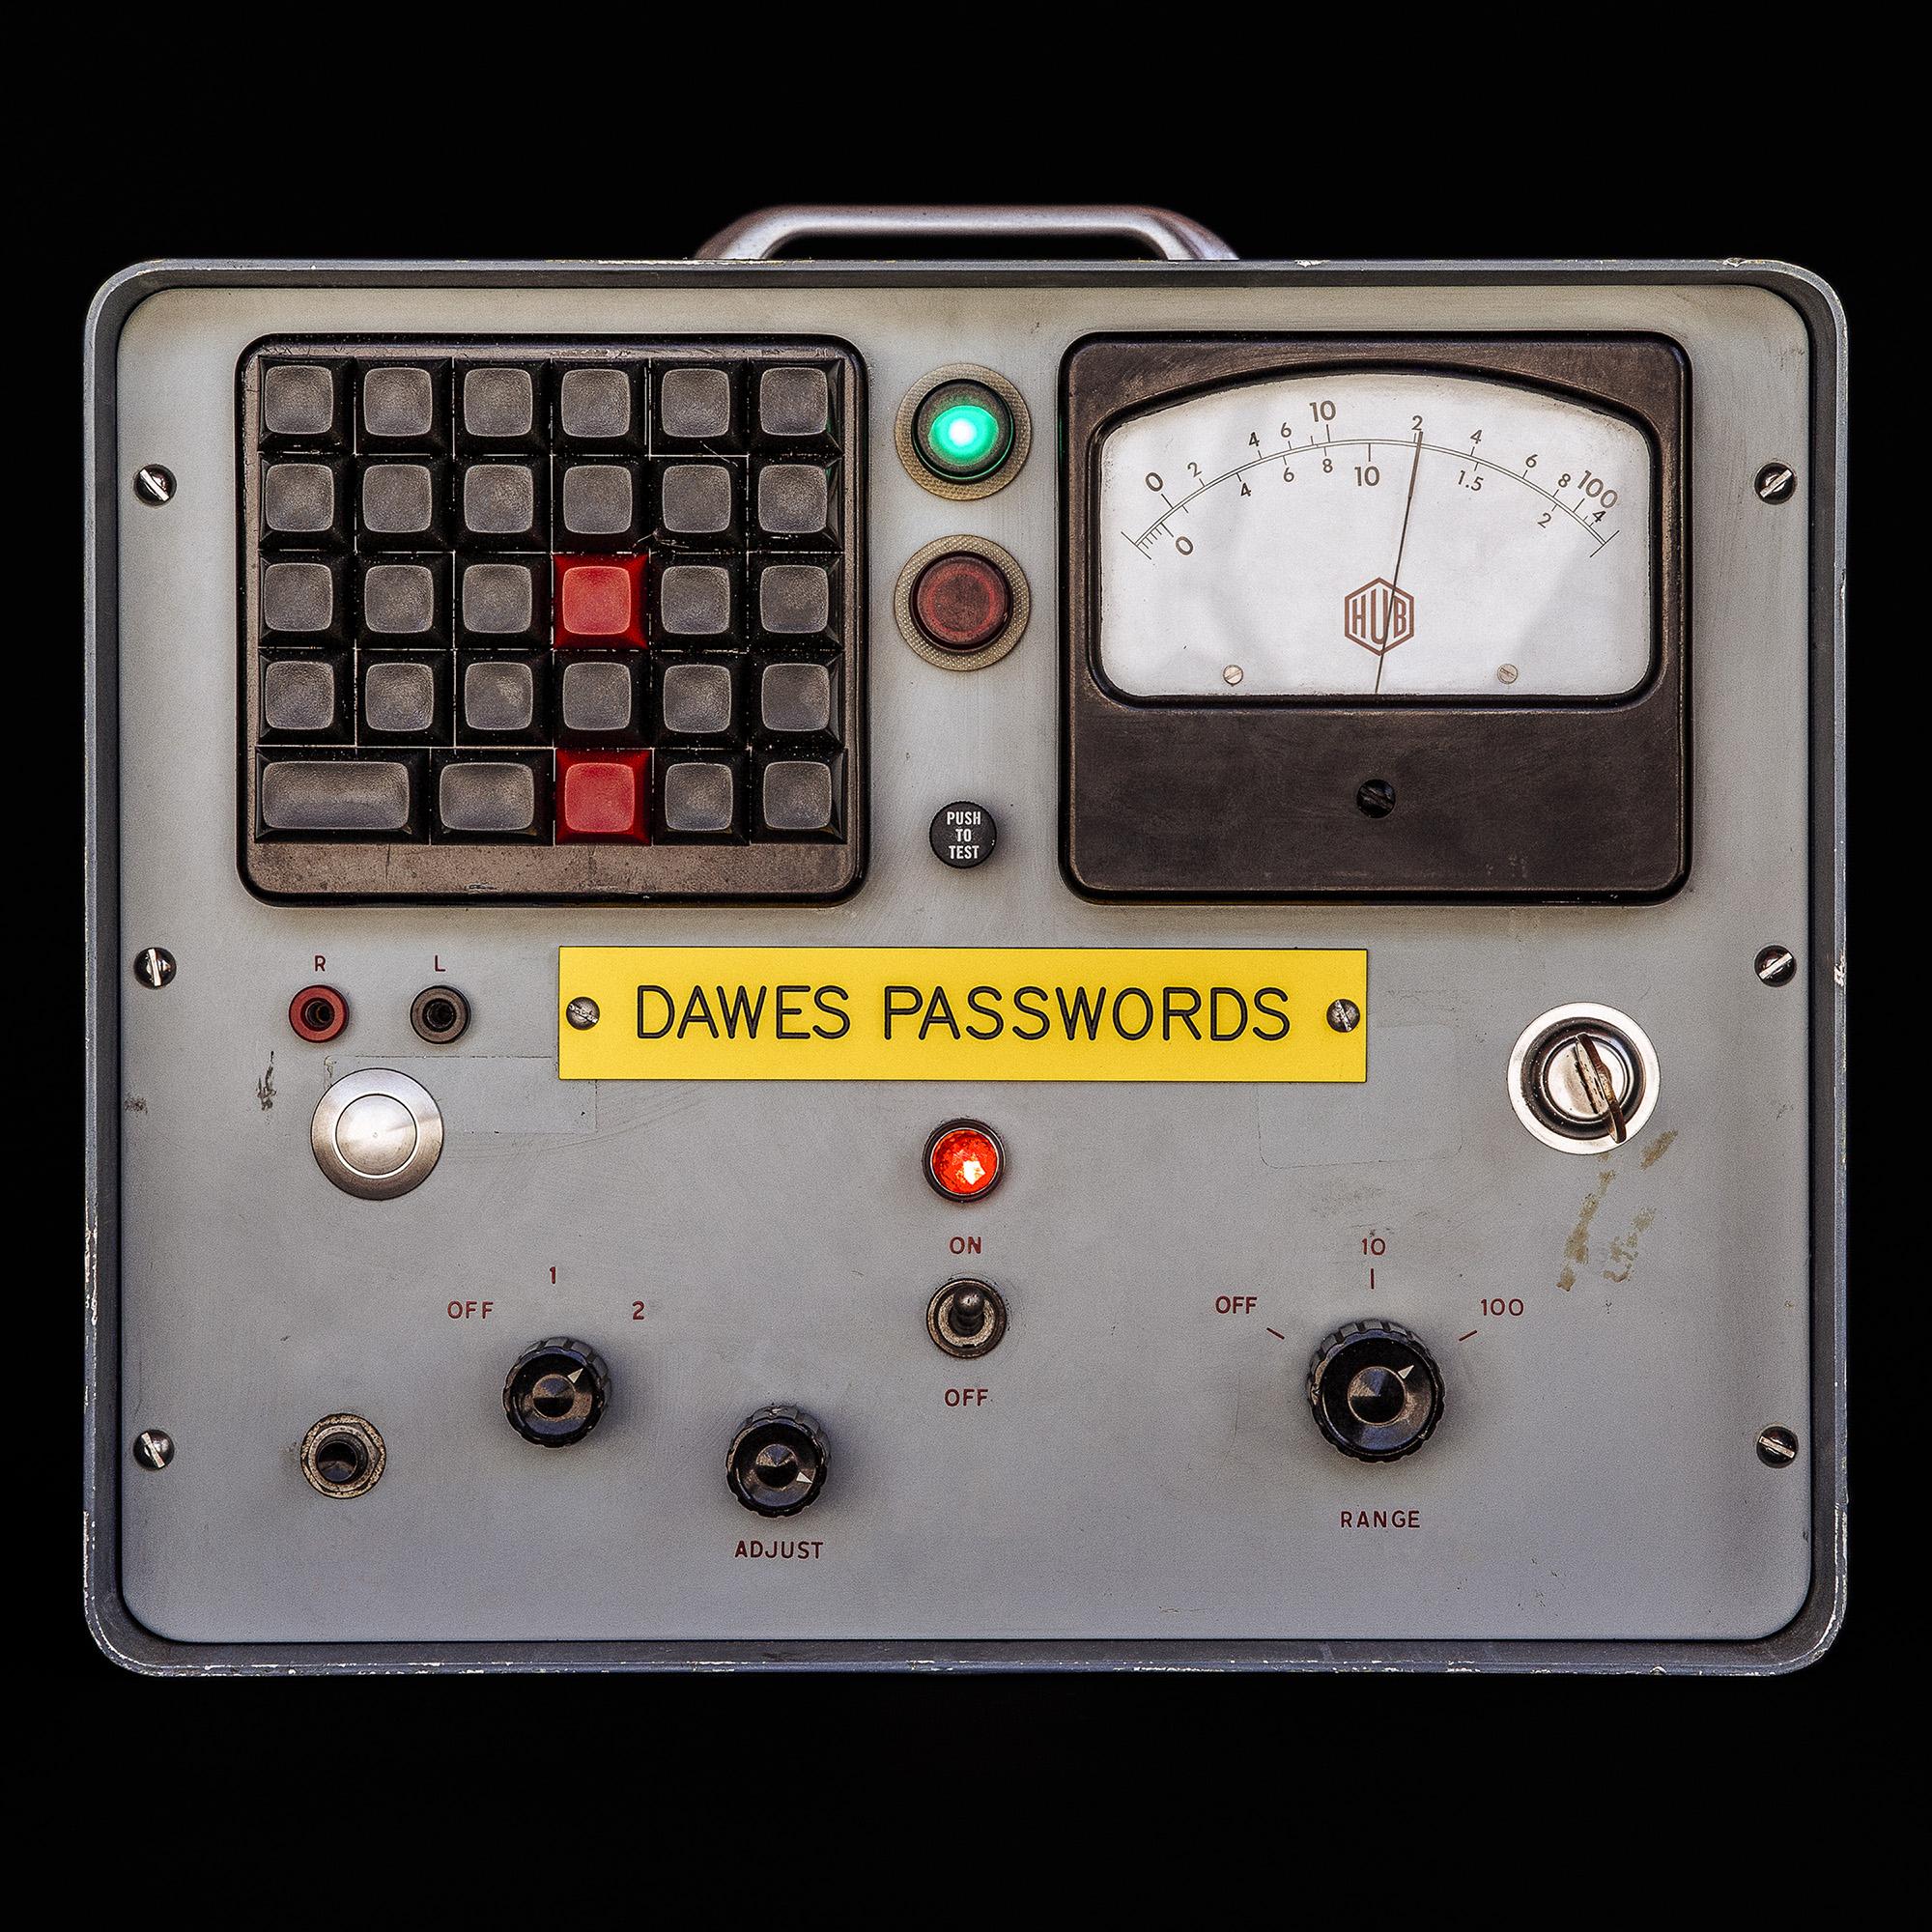 dawes passwords cover 2000x2000 DAWES PASSWORDS COVER 2000x2000